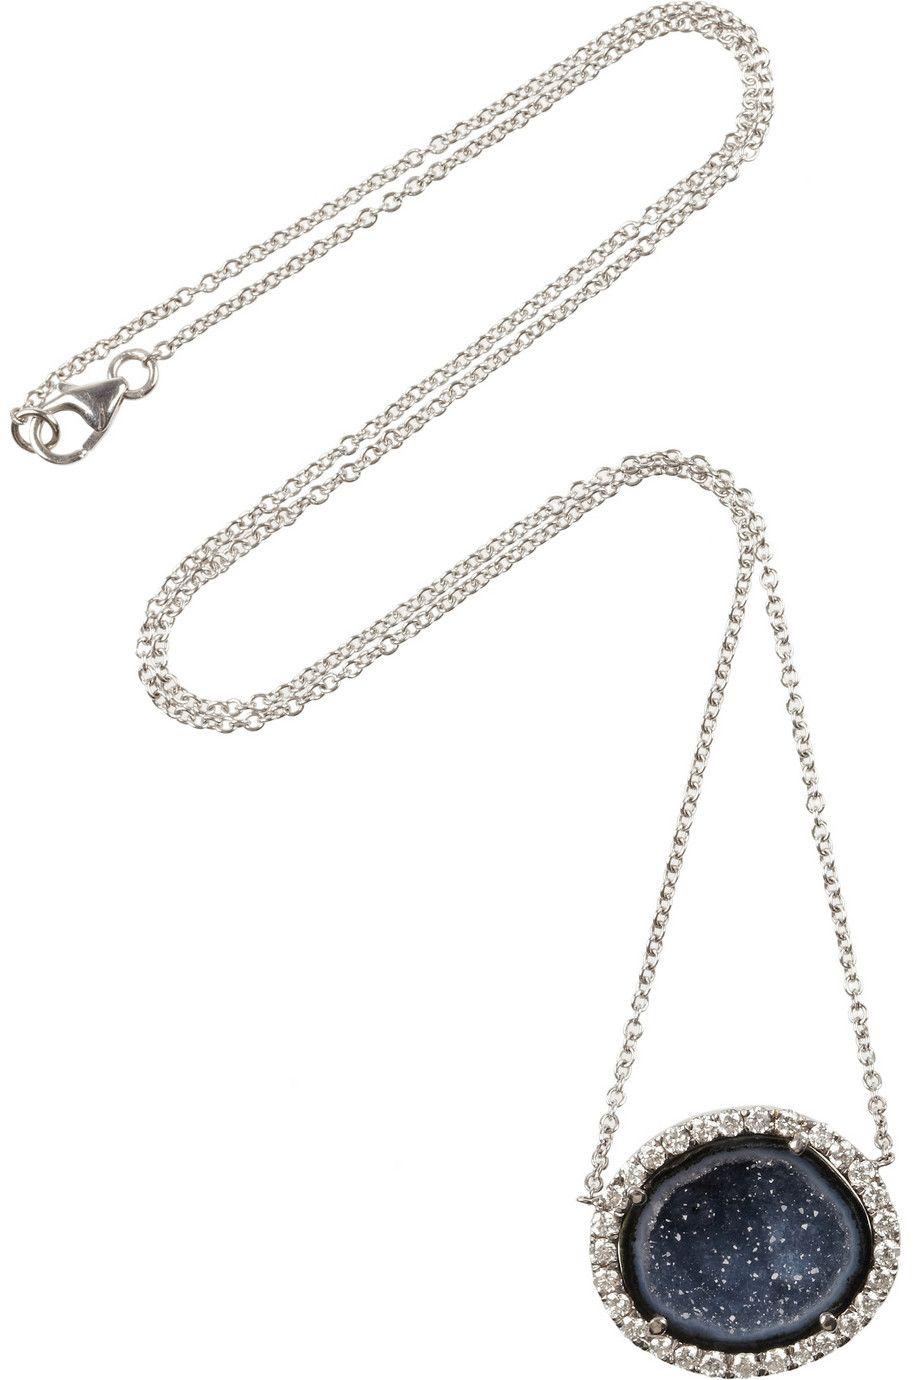 18-karat Rose Gold, Geode And Diamond Necklace - one size Kimberly McDonald